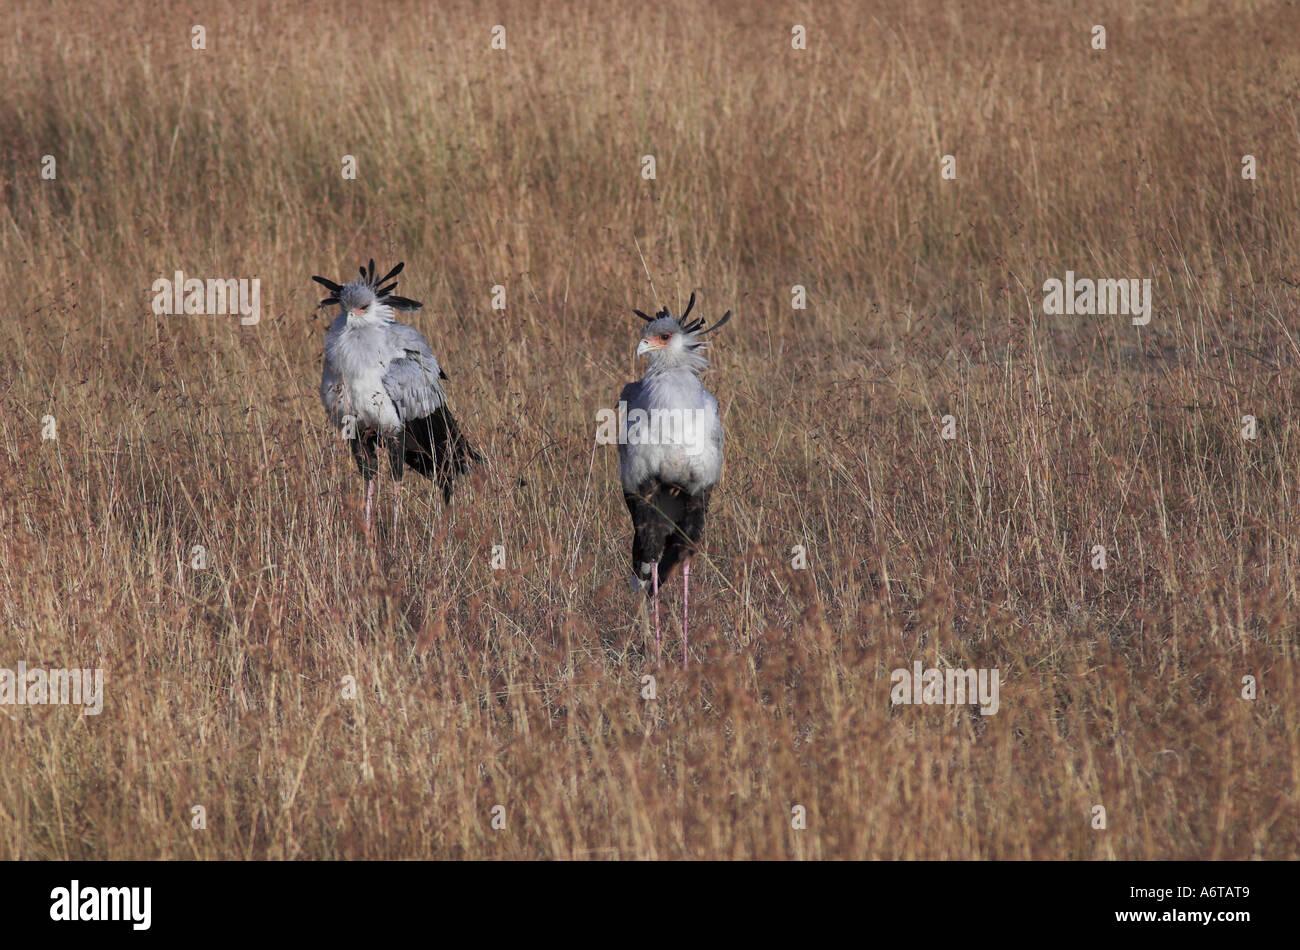 Secretary Birds in Kenya, East Africa Stock Photo